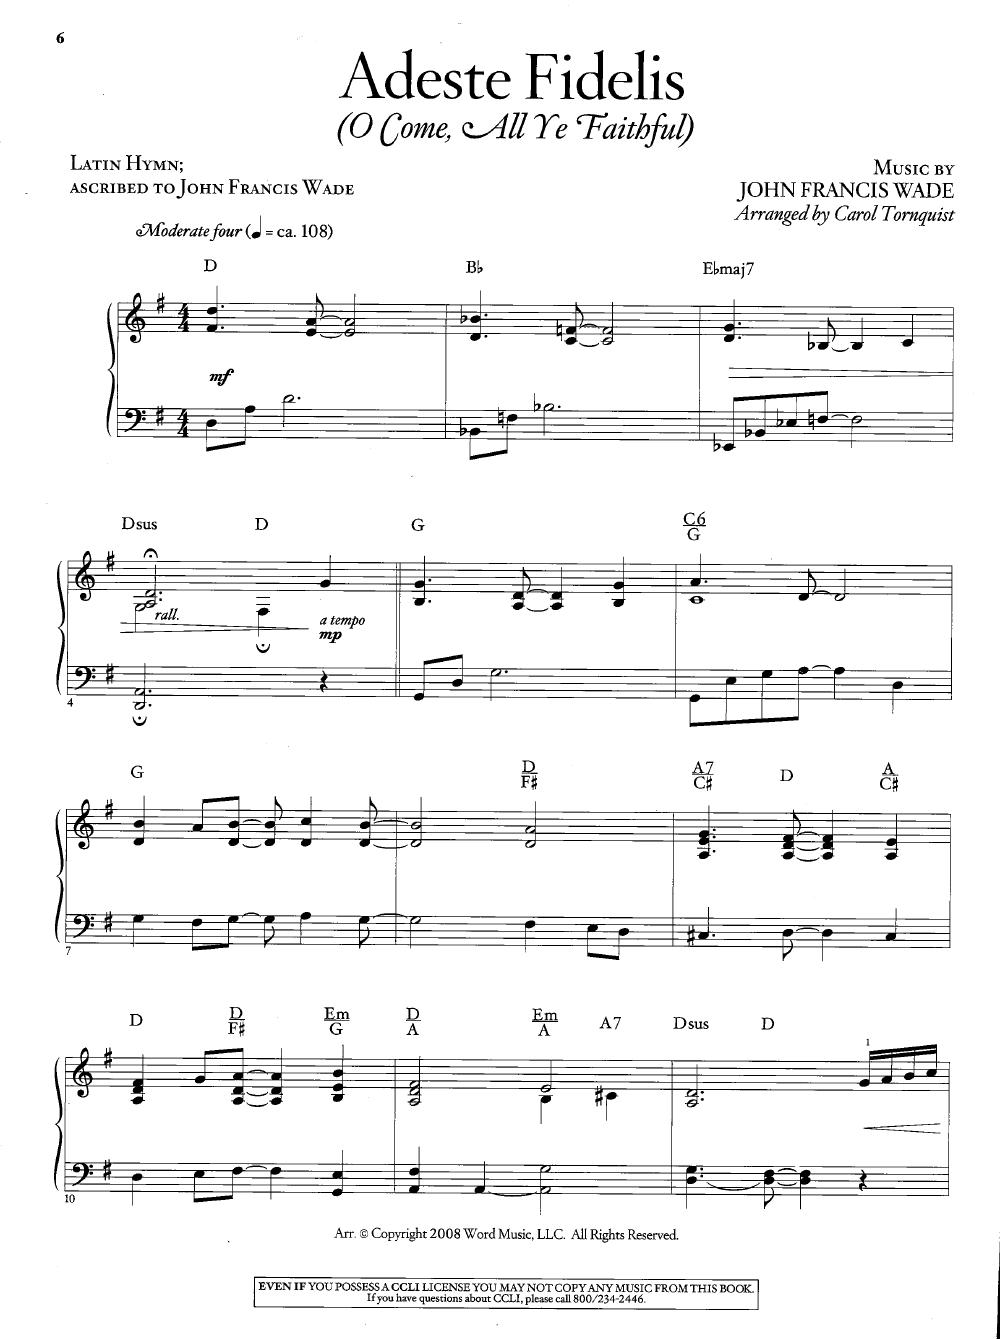 Top 25 Christmas Songs For Solo Piano ( Pian   J.w. Pepper Sheet Music - Christmas Songs Piano Sheet Music Free Printable